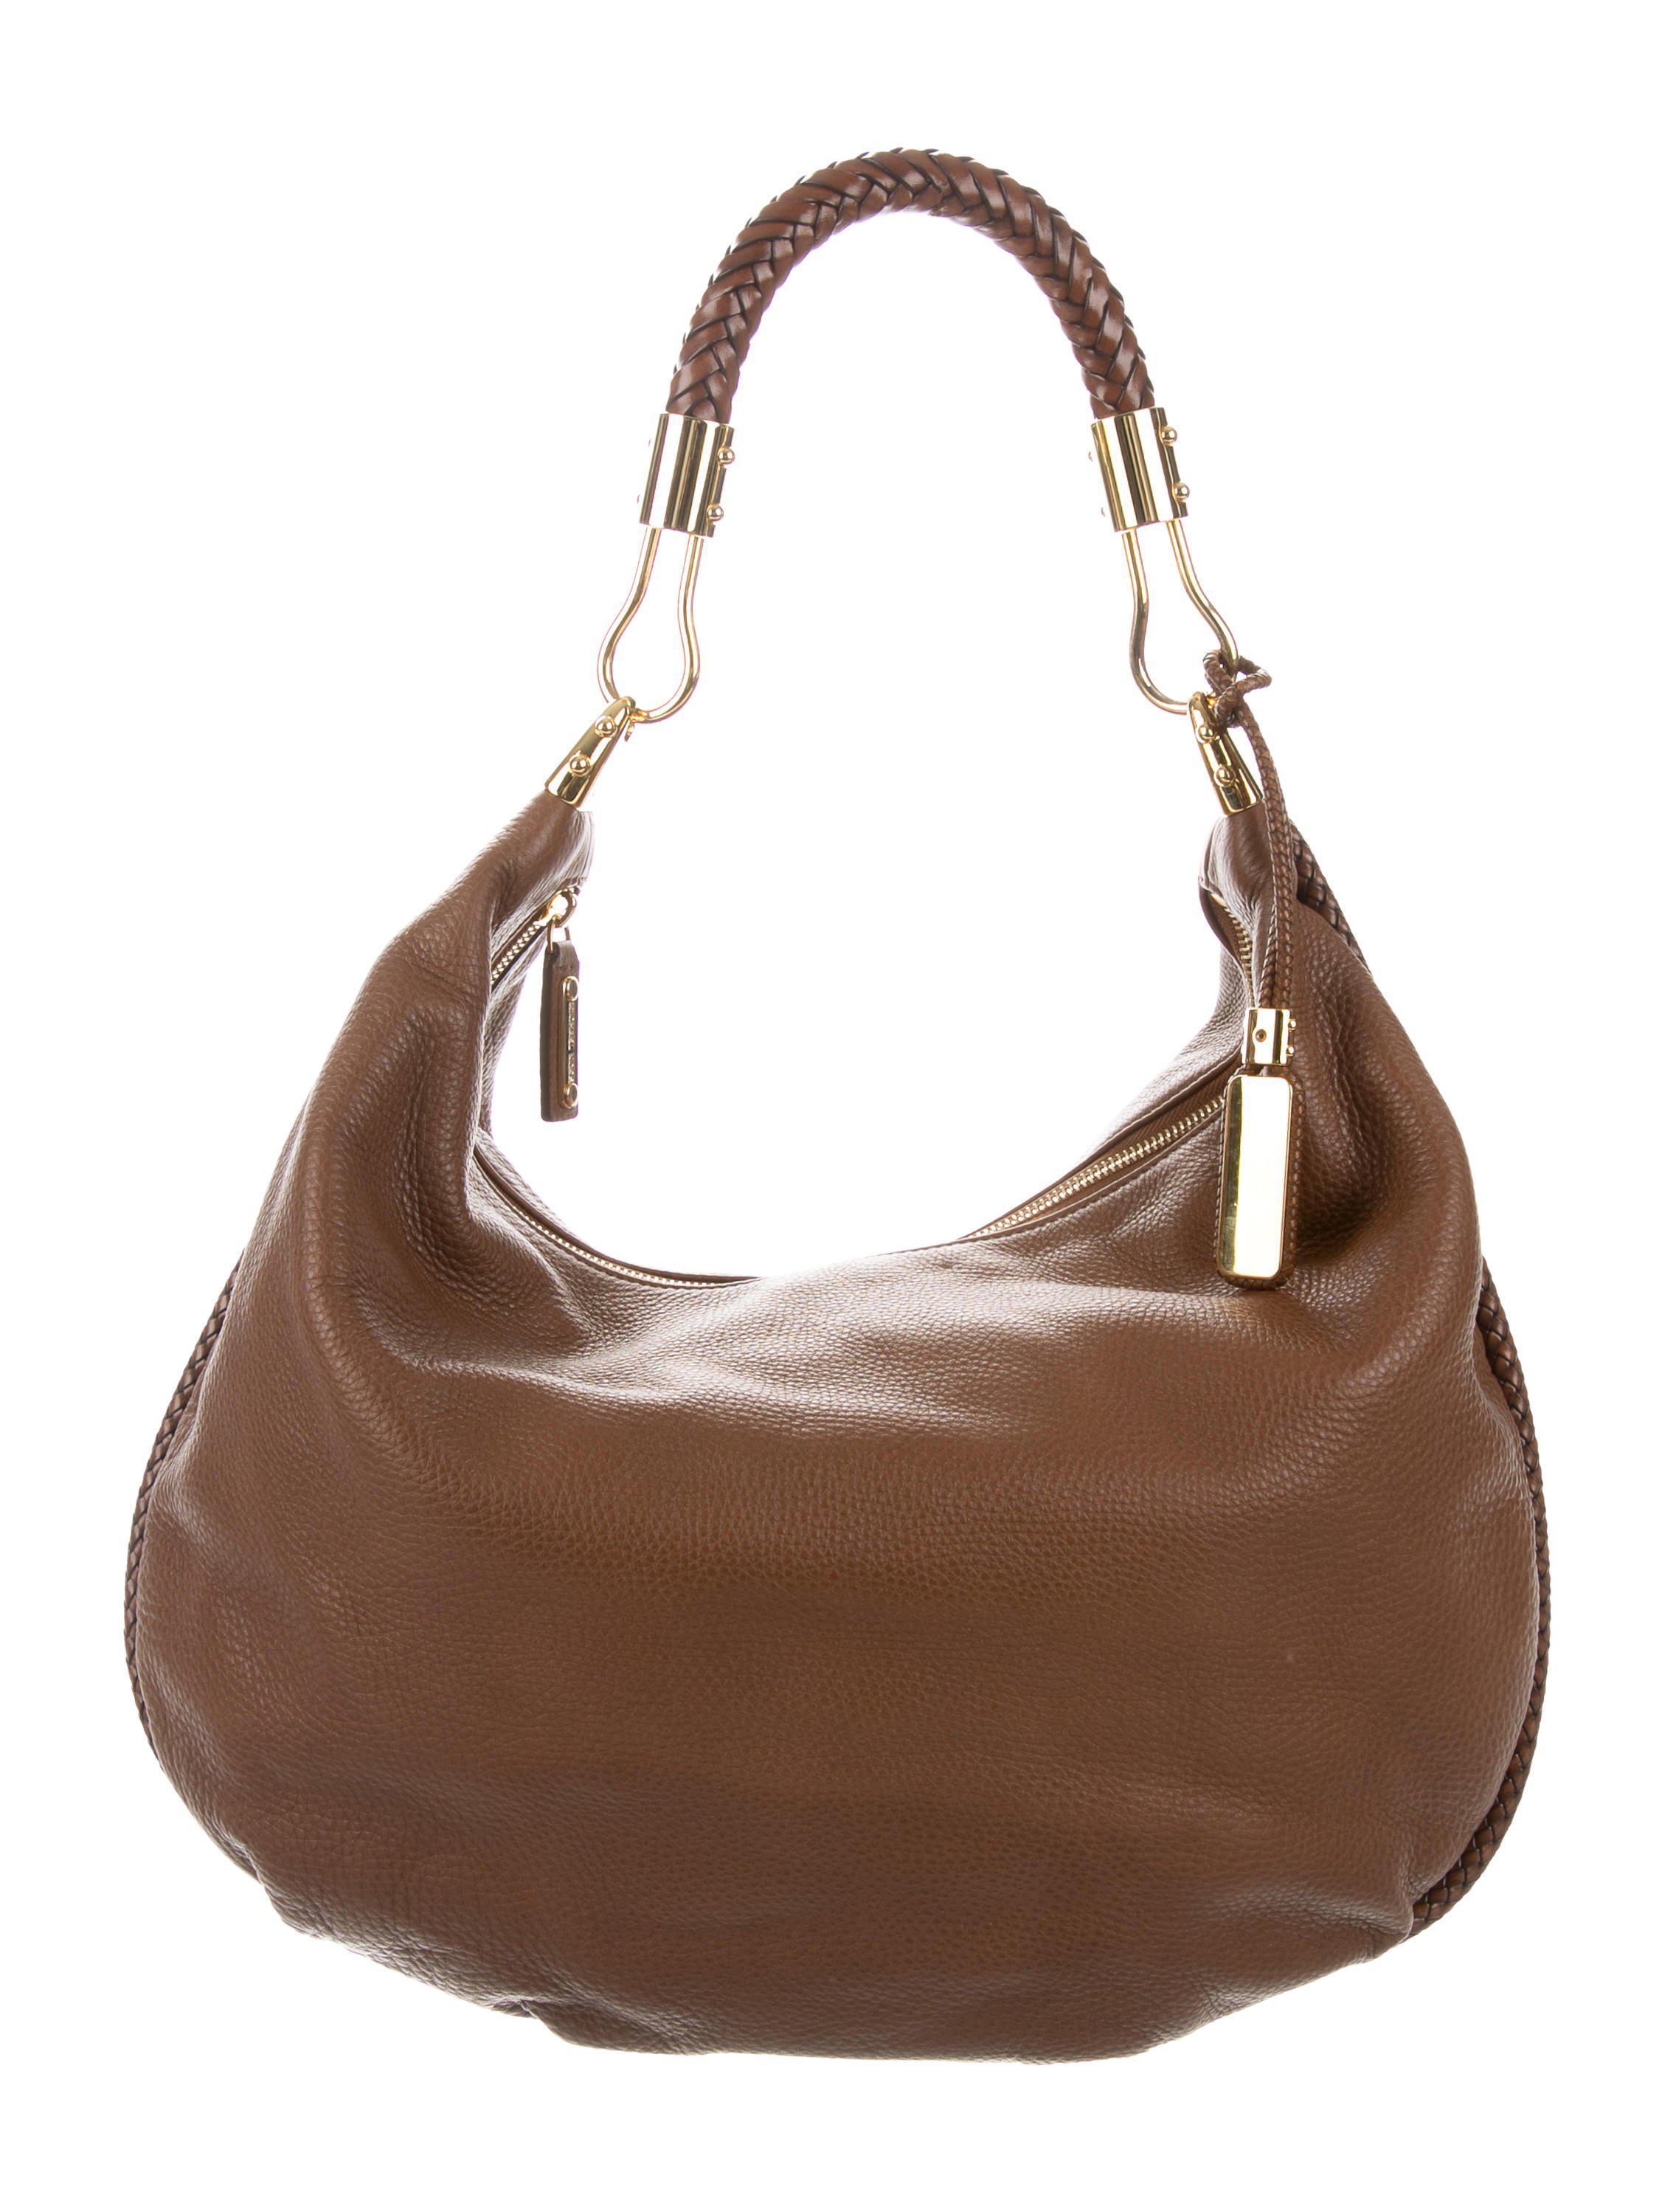 cb320e47a015 Lyst - Michael Kors Skorpios Hobo Bag Brown in Metallic